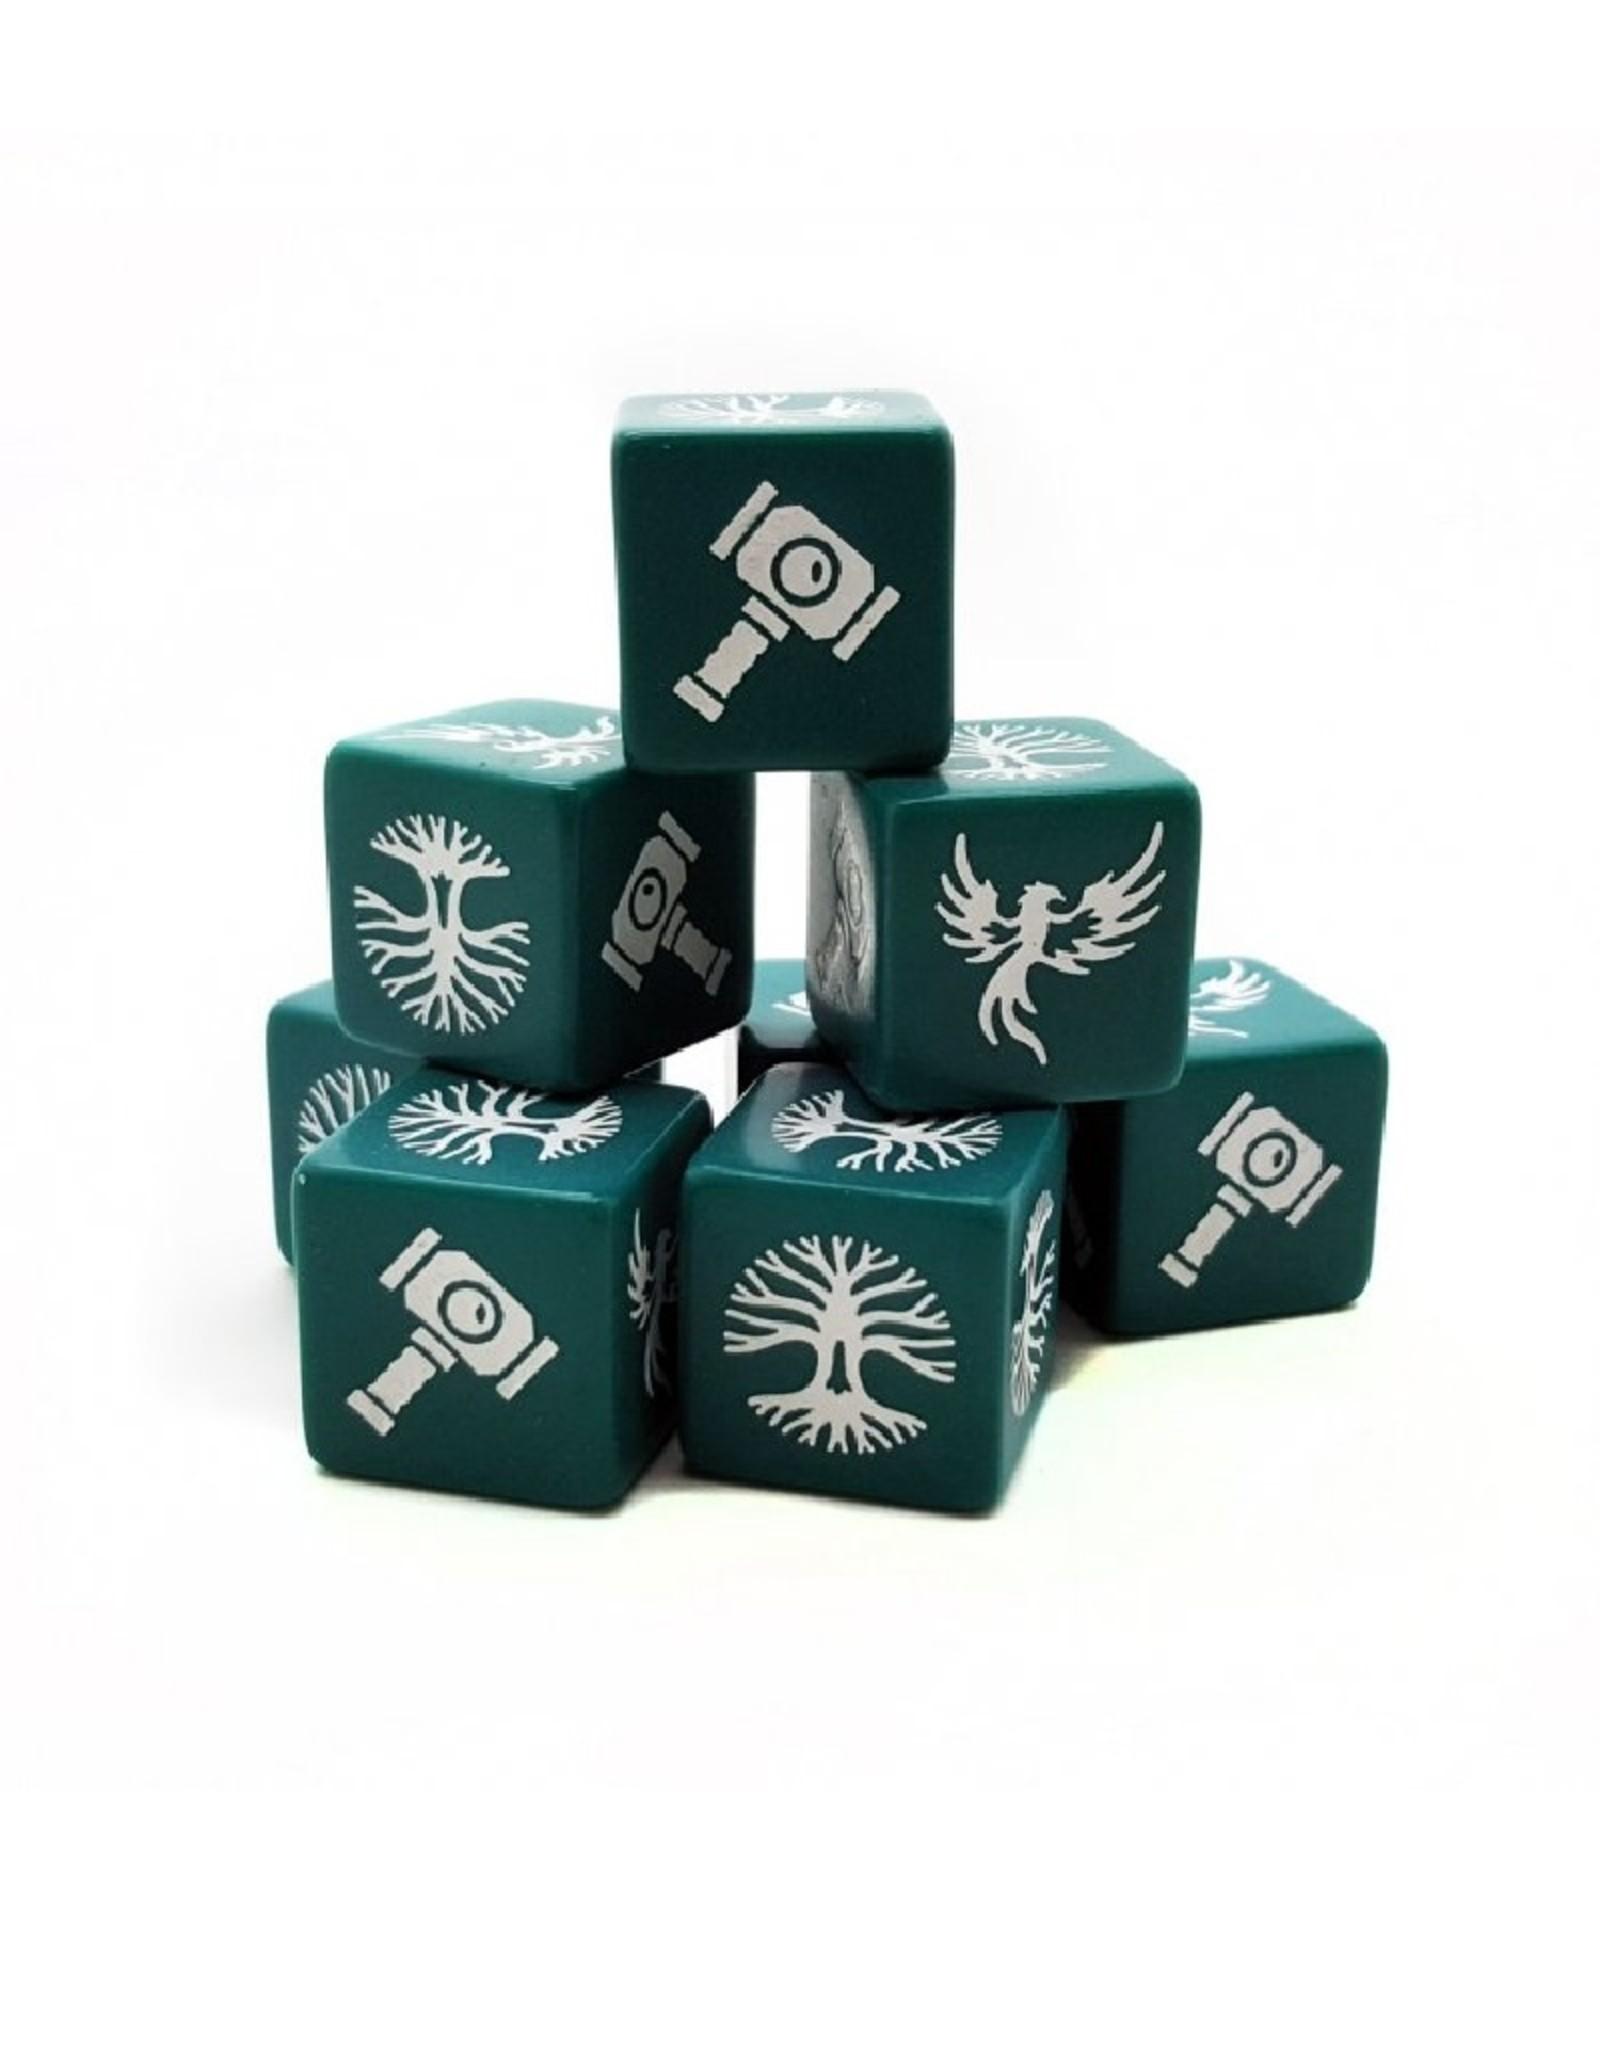 Studio Tomahawk Saga - Forces of Order dice